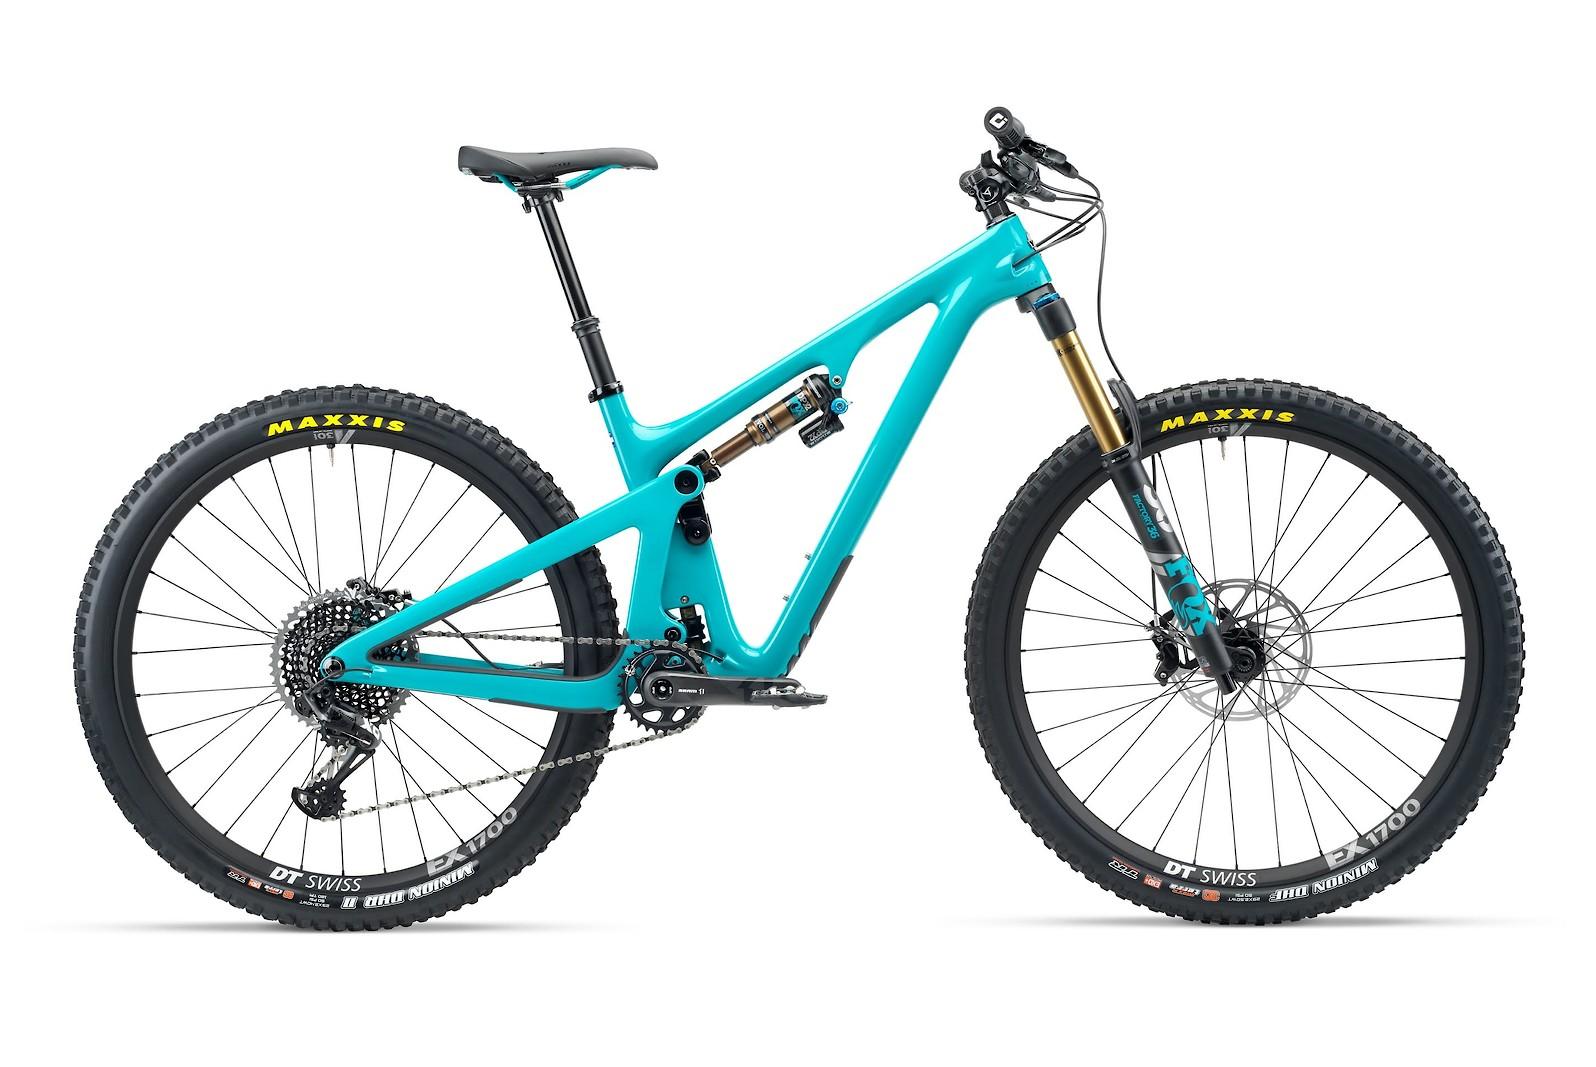 2020 Yeti SB130 TLR (Turquoise)